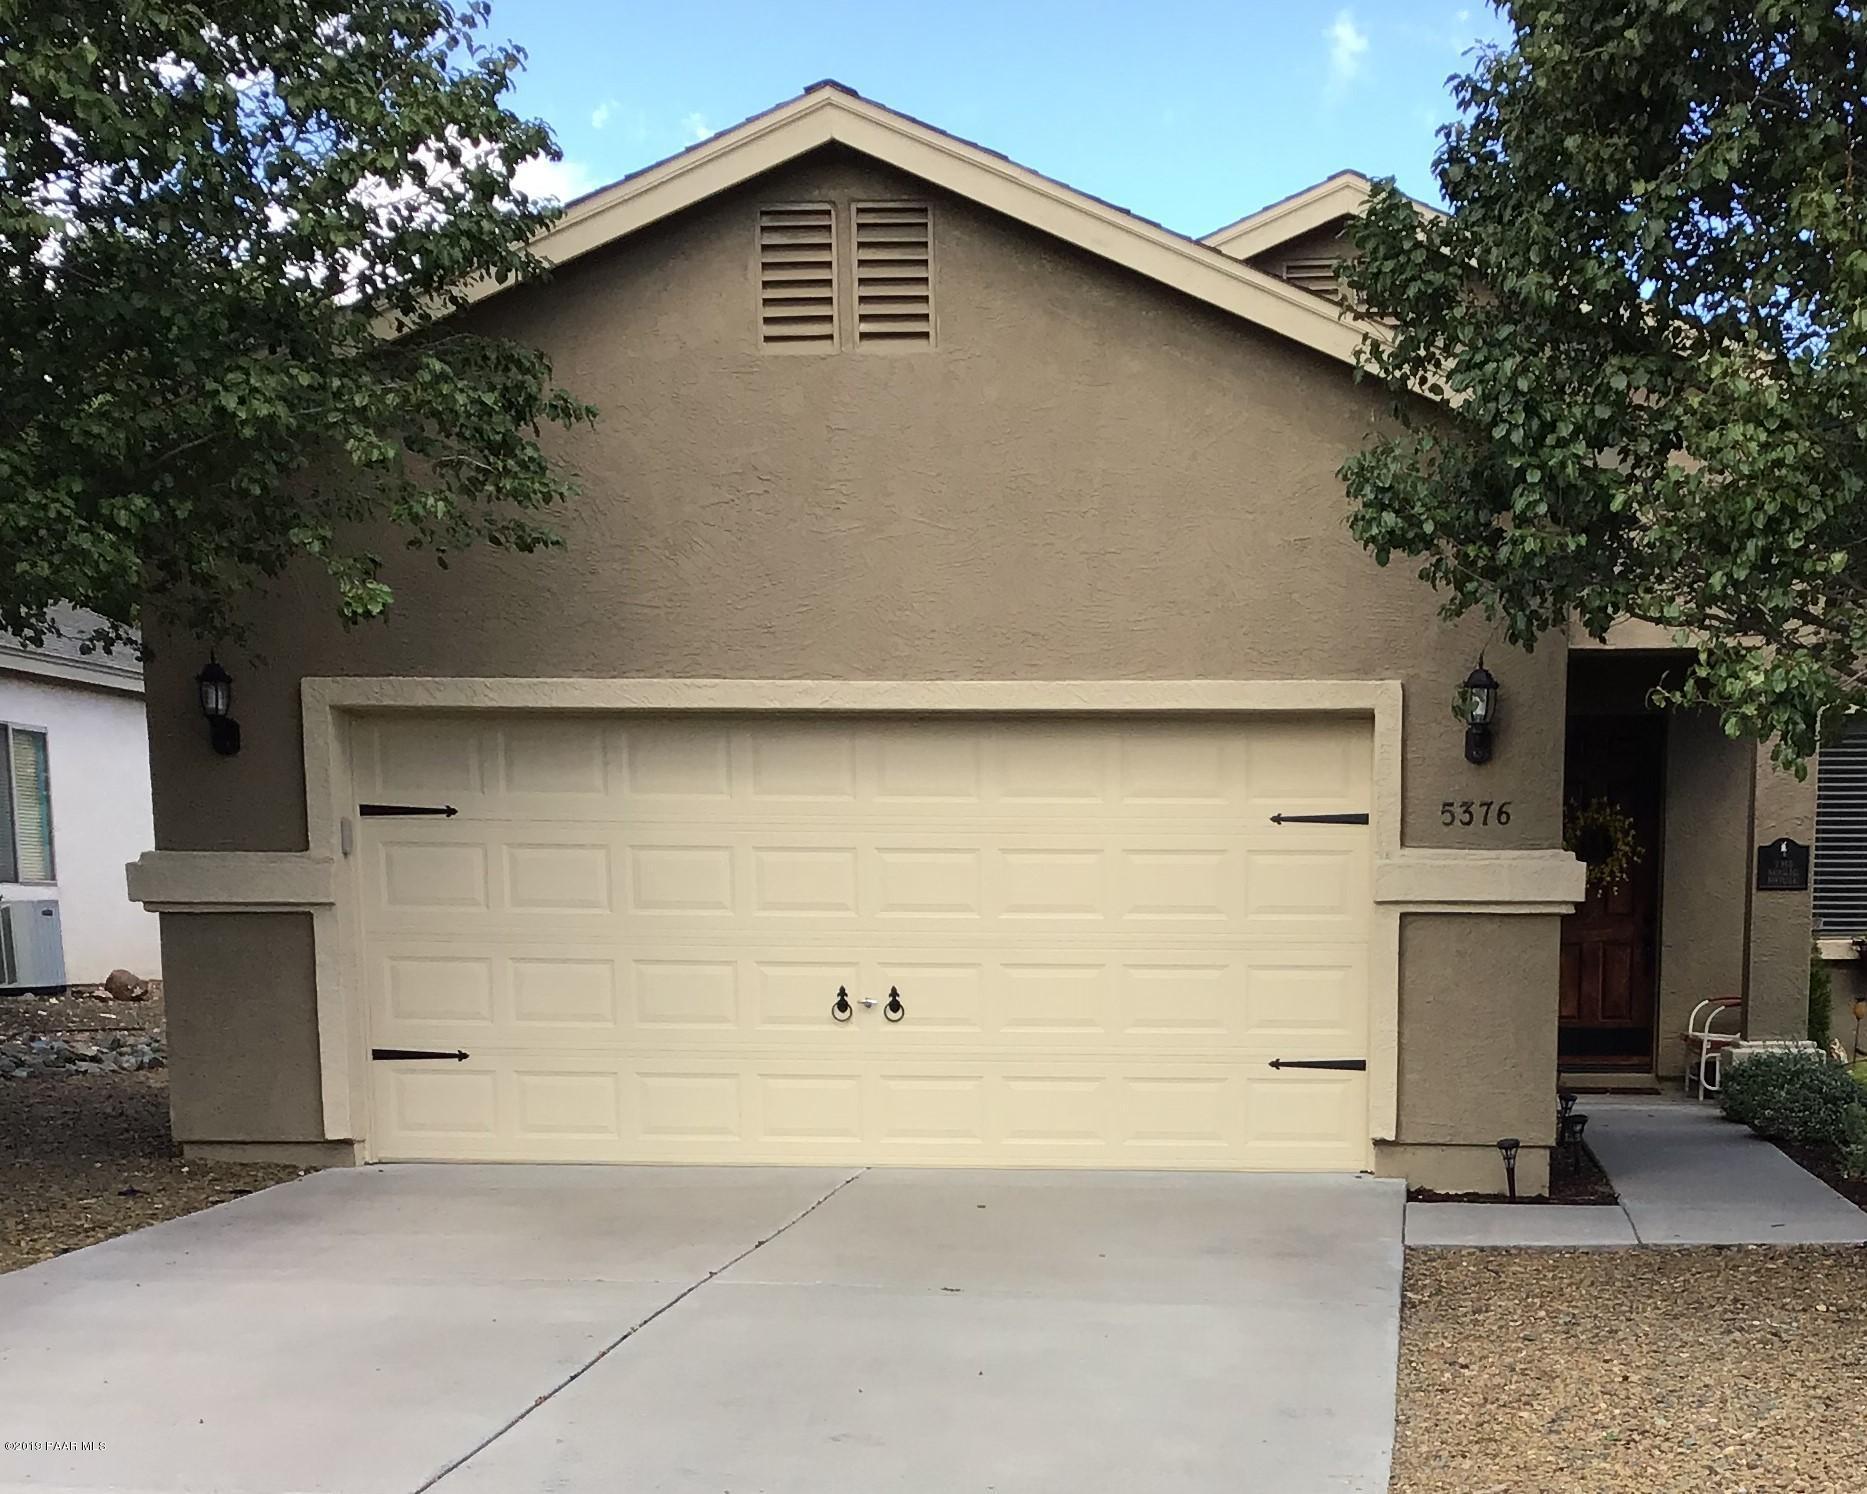 Photo of 5376 Bremont, Prescott Valley, AZ 86314